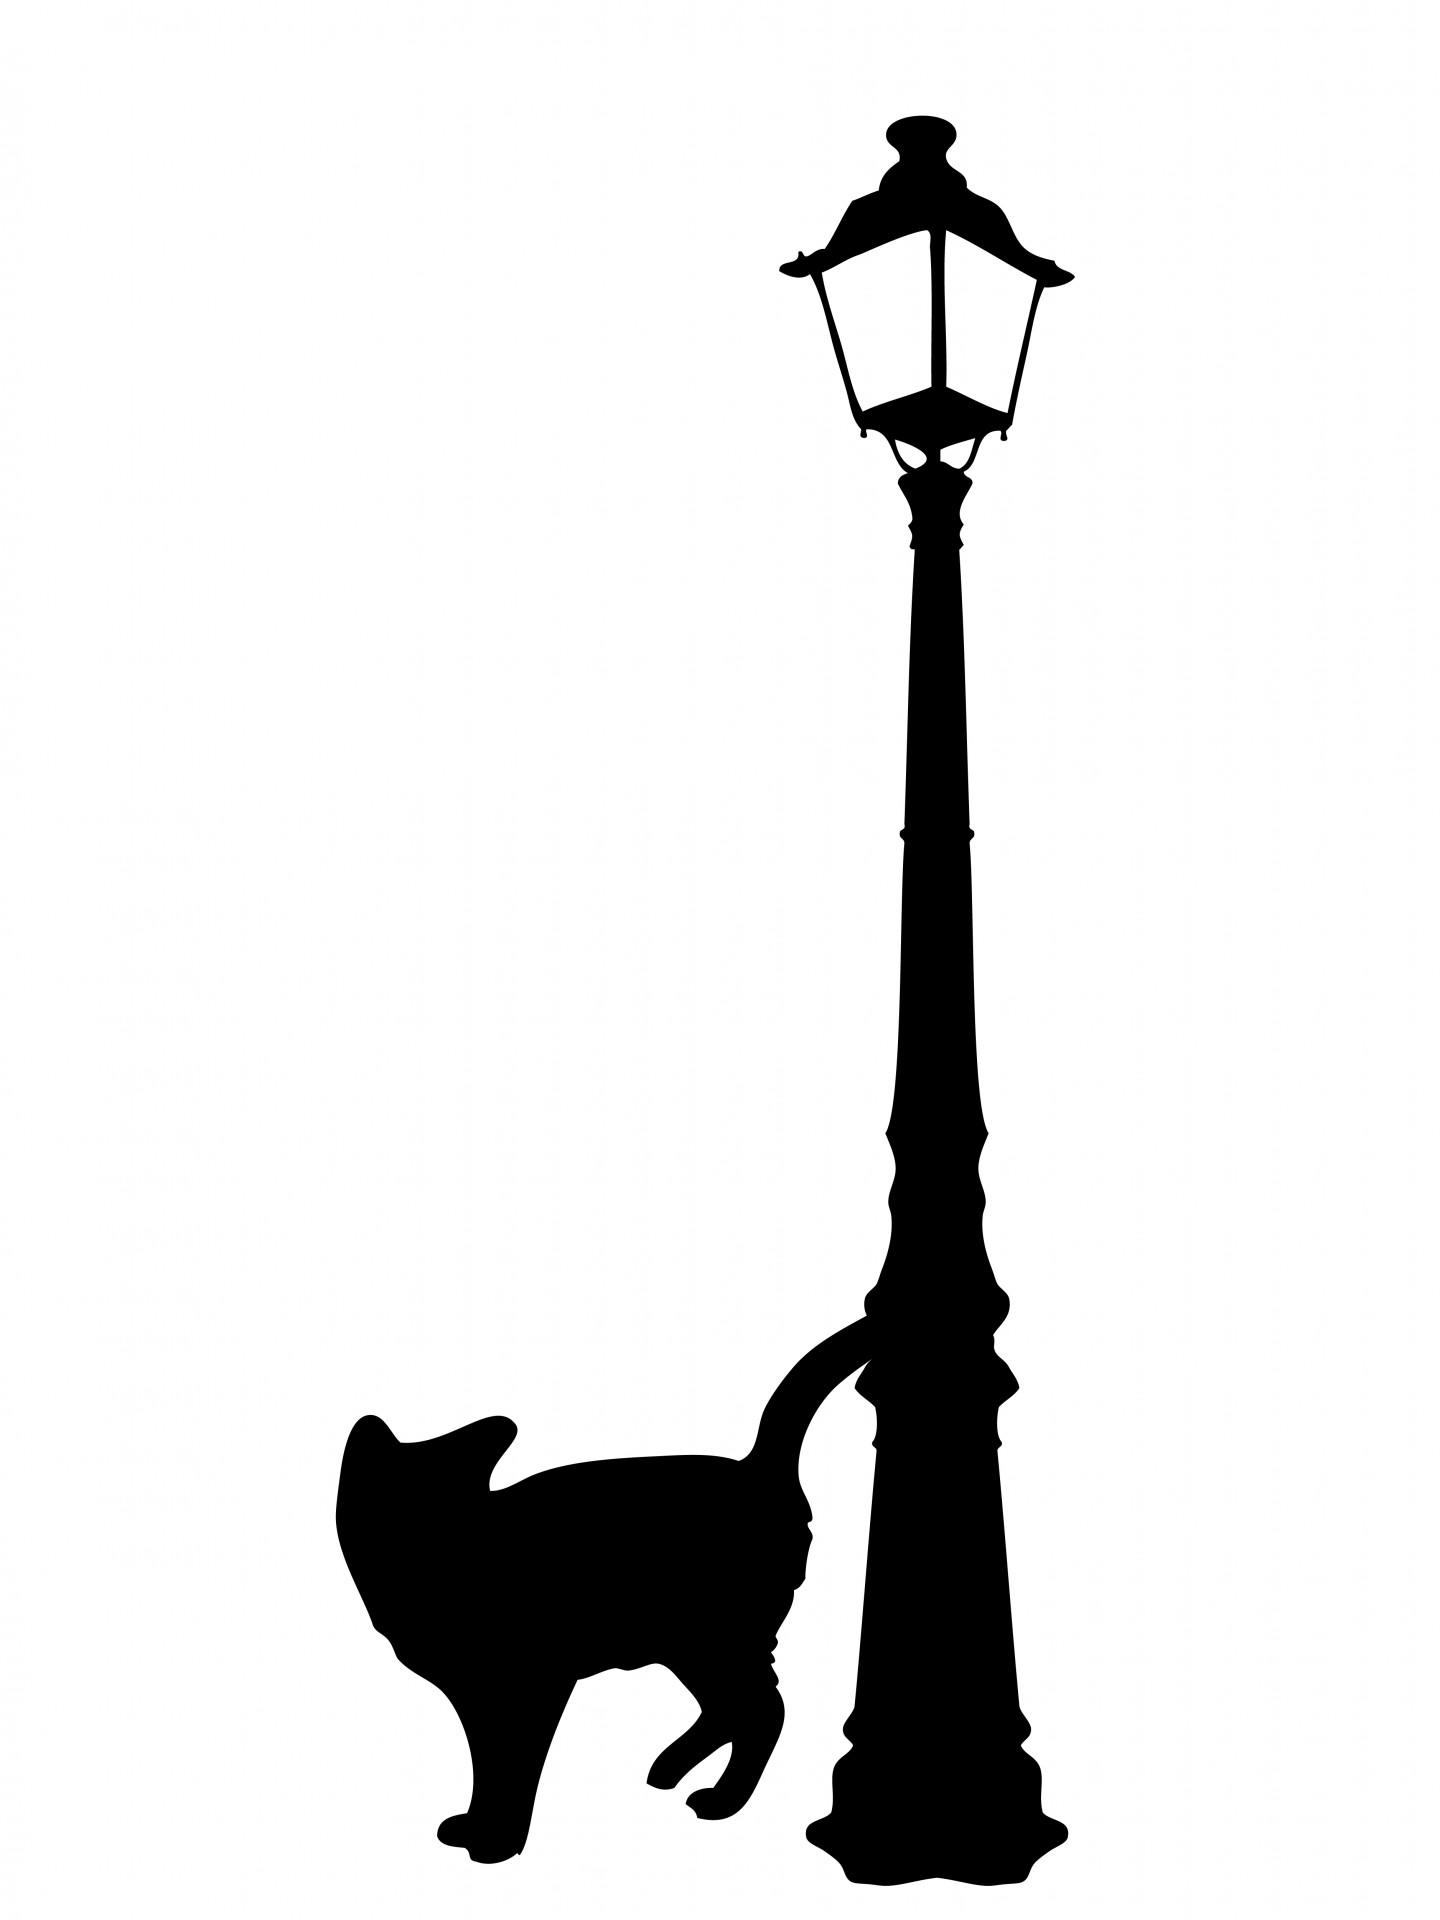 Black Cat Silhouette Clipart Free Stock Photo